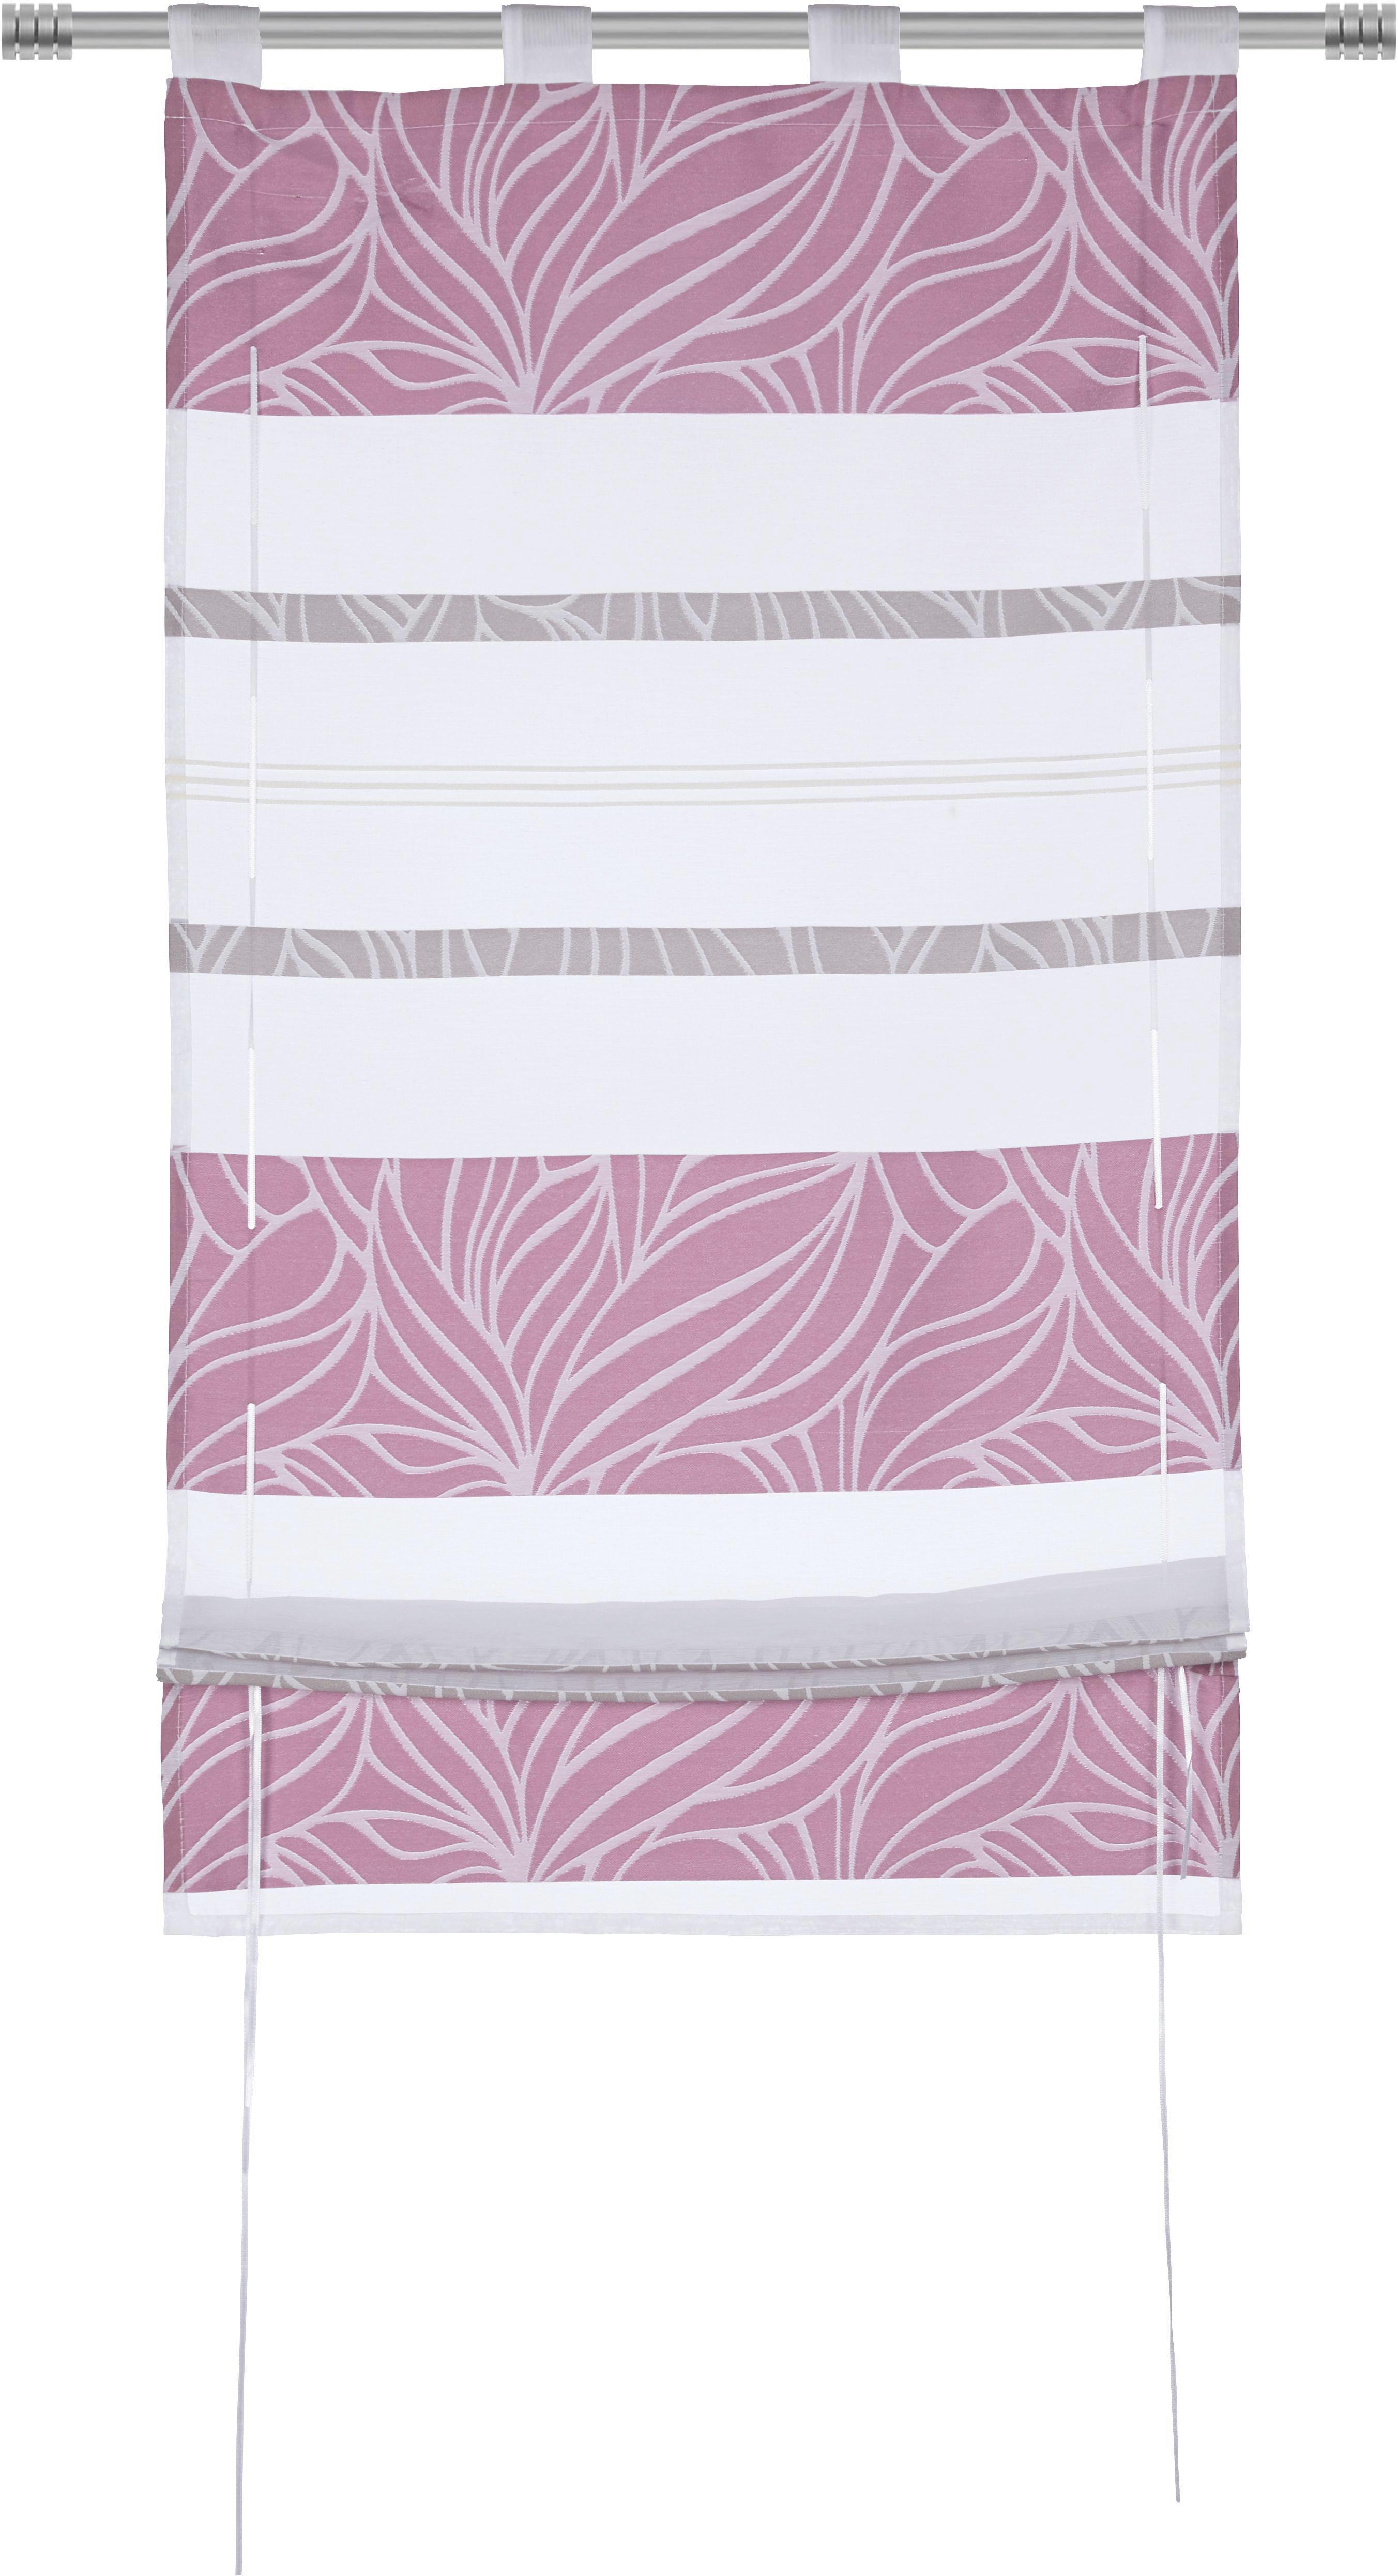 Bändchenrollo Anita, ca. 80x140cm - Lila, KONVENTIONELL, Textil (80/140cm) - MÖMAX modern living